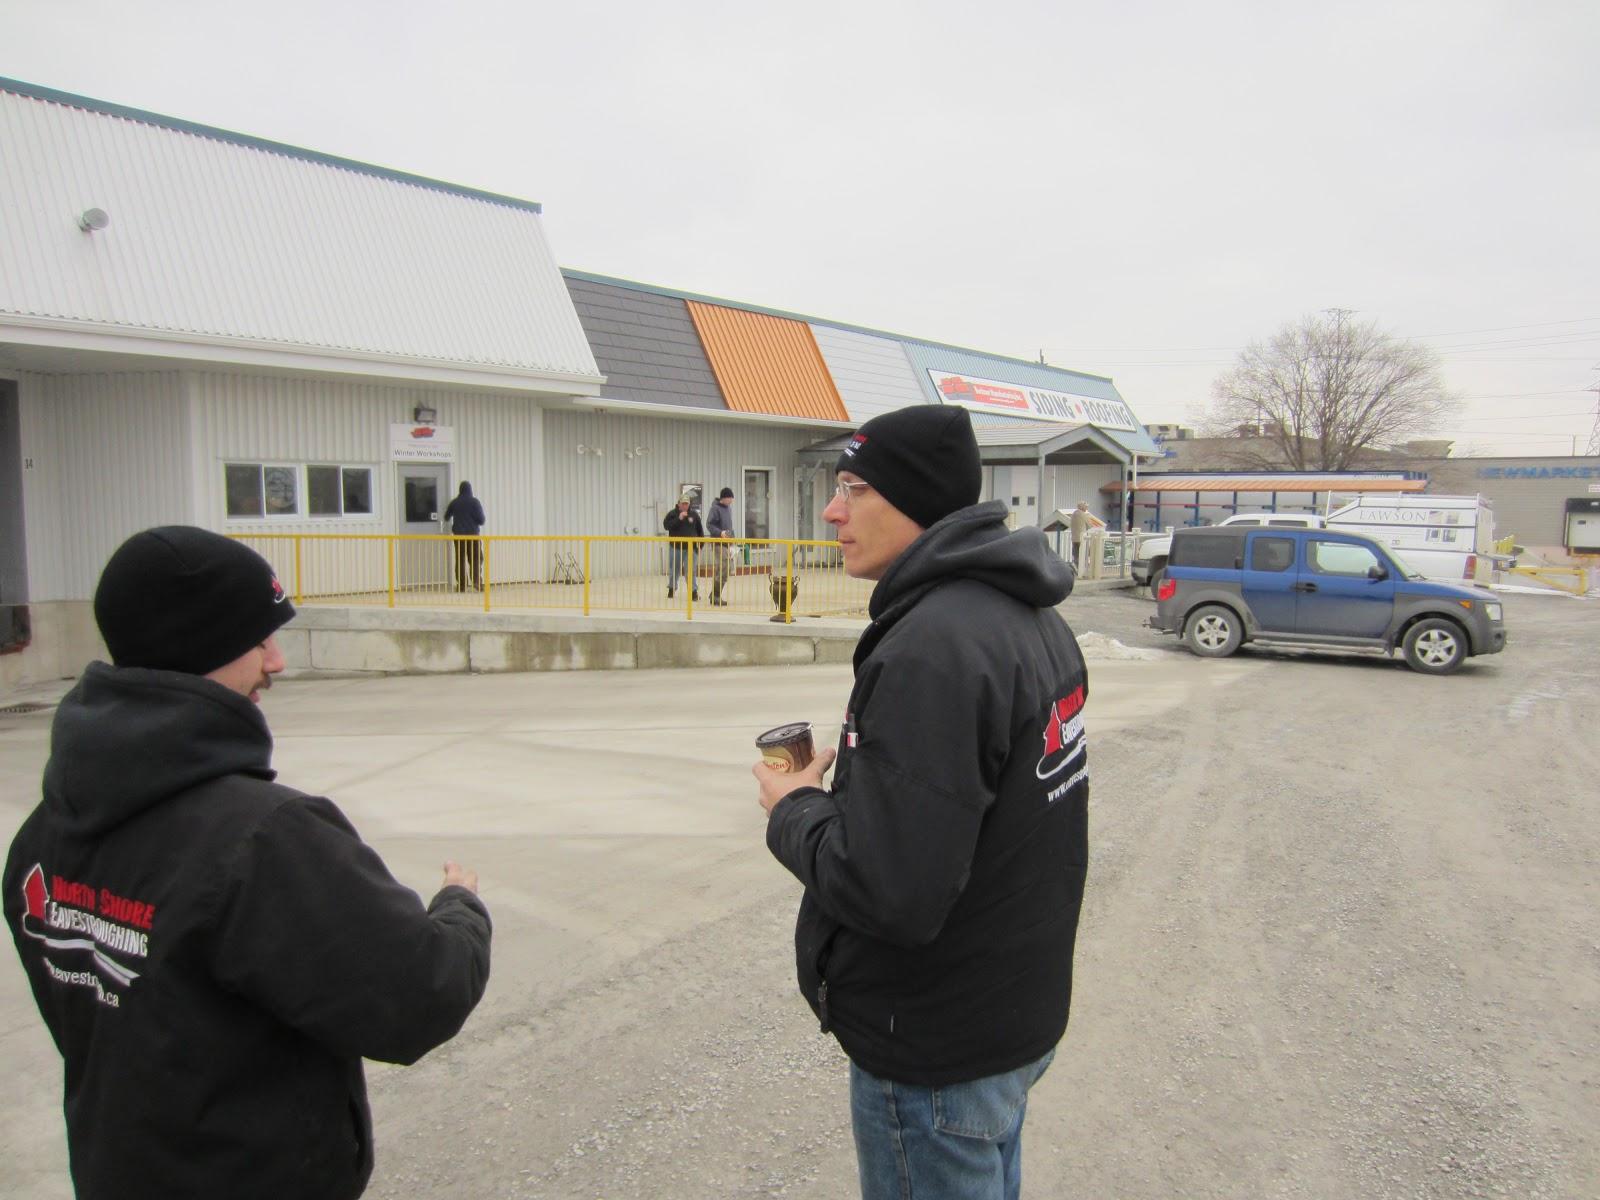 Toronto Eavestroughing Buchner Winter Workshop